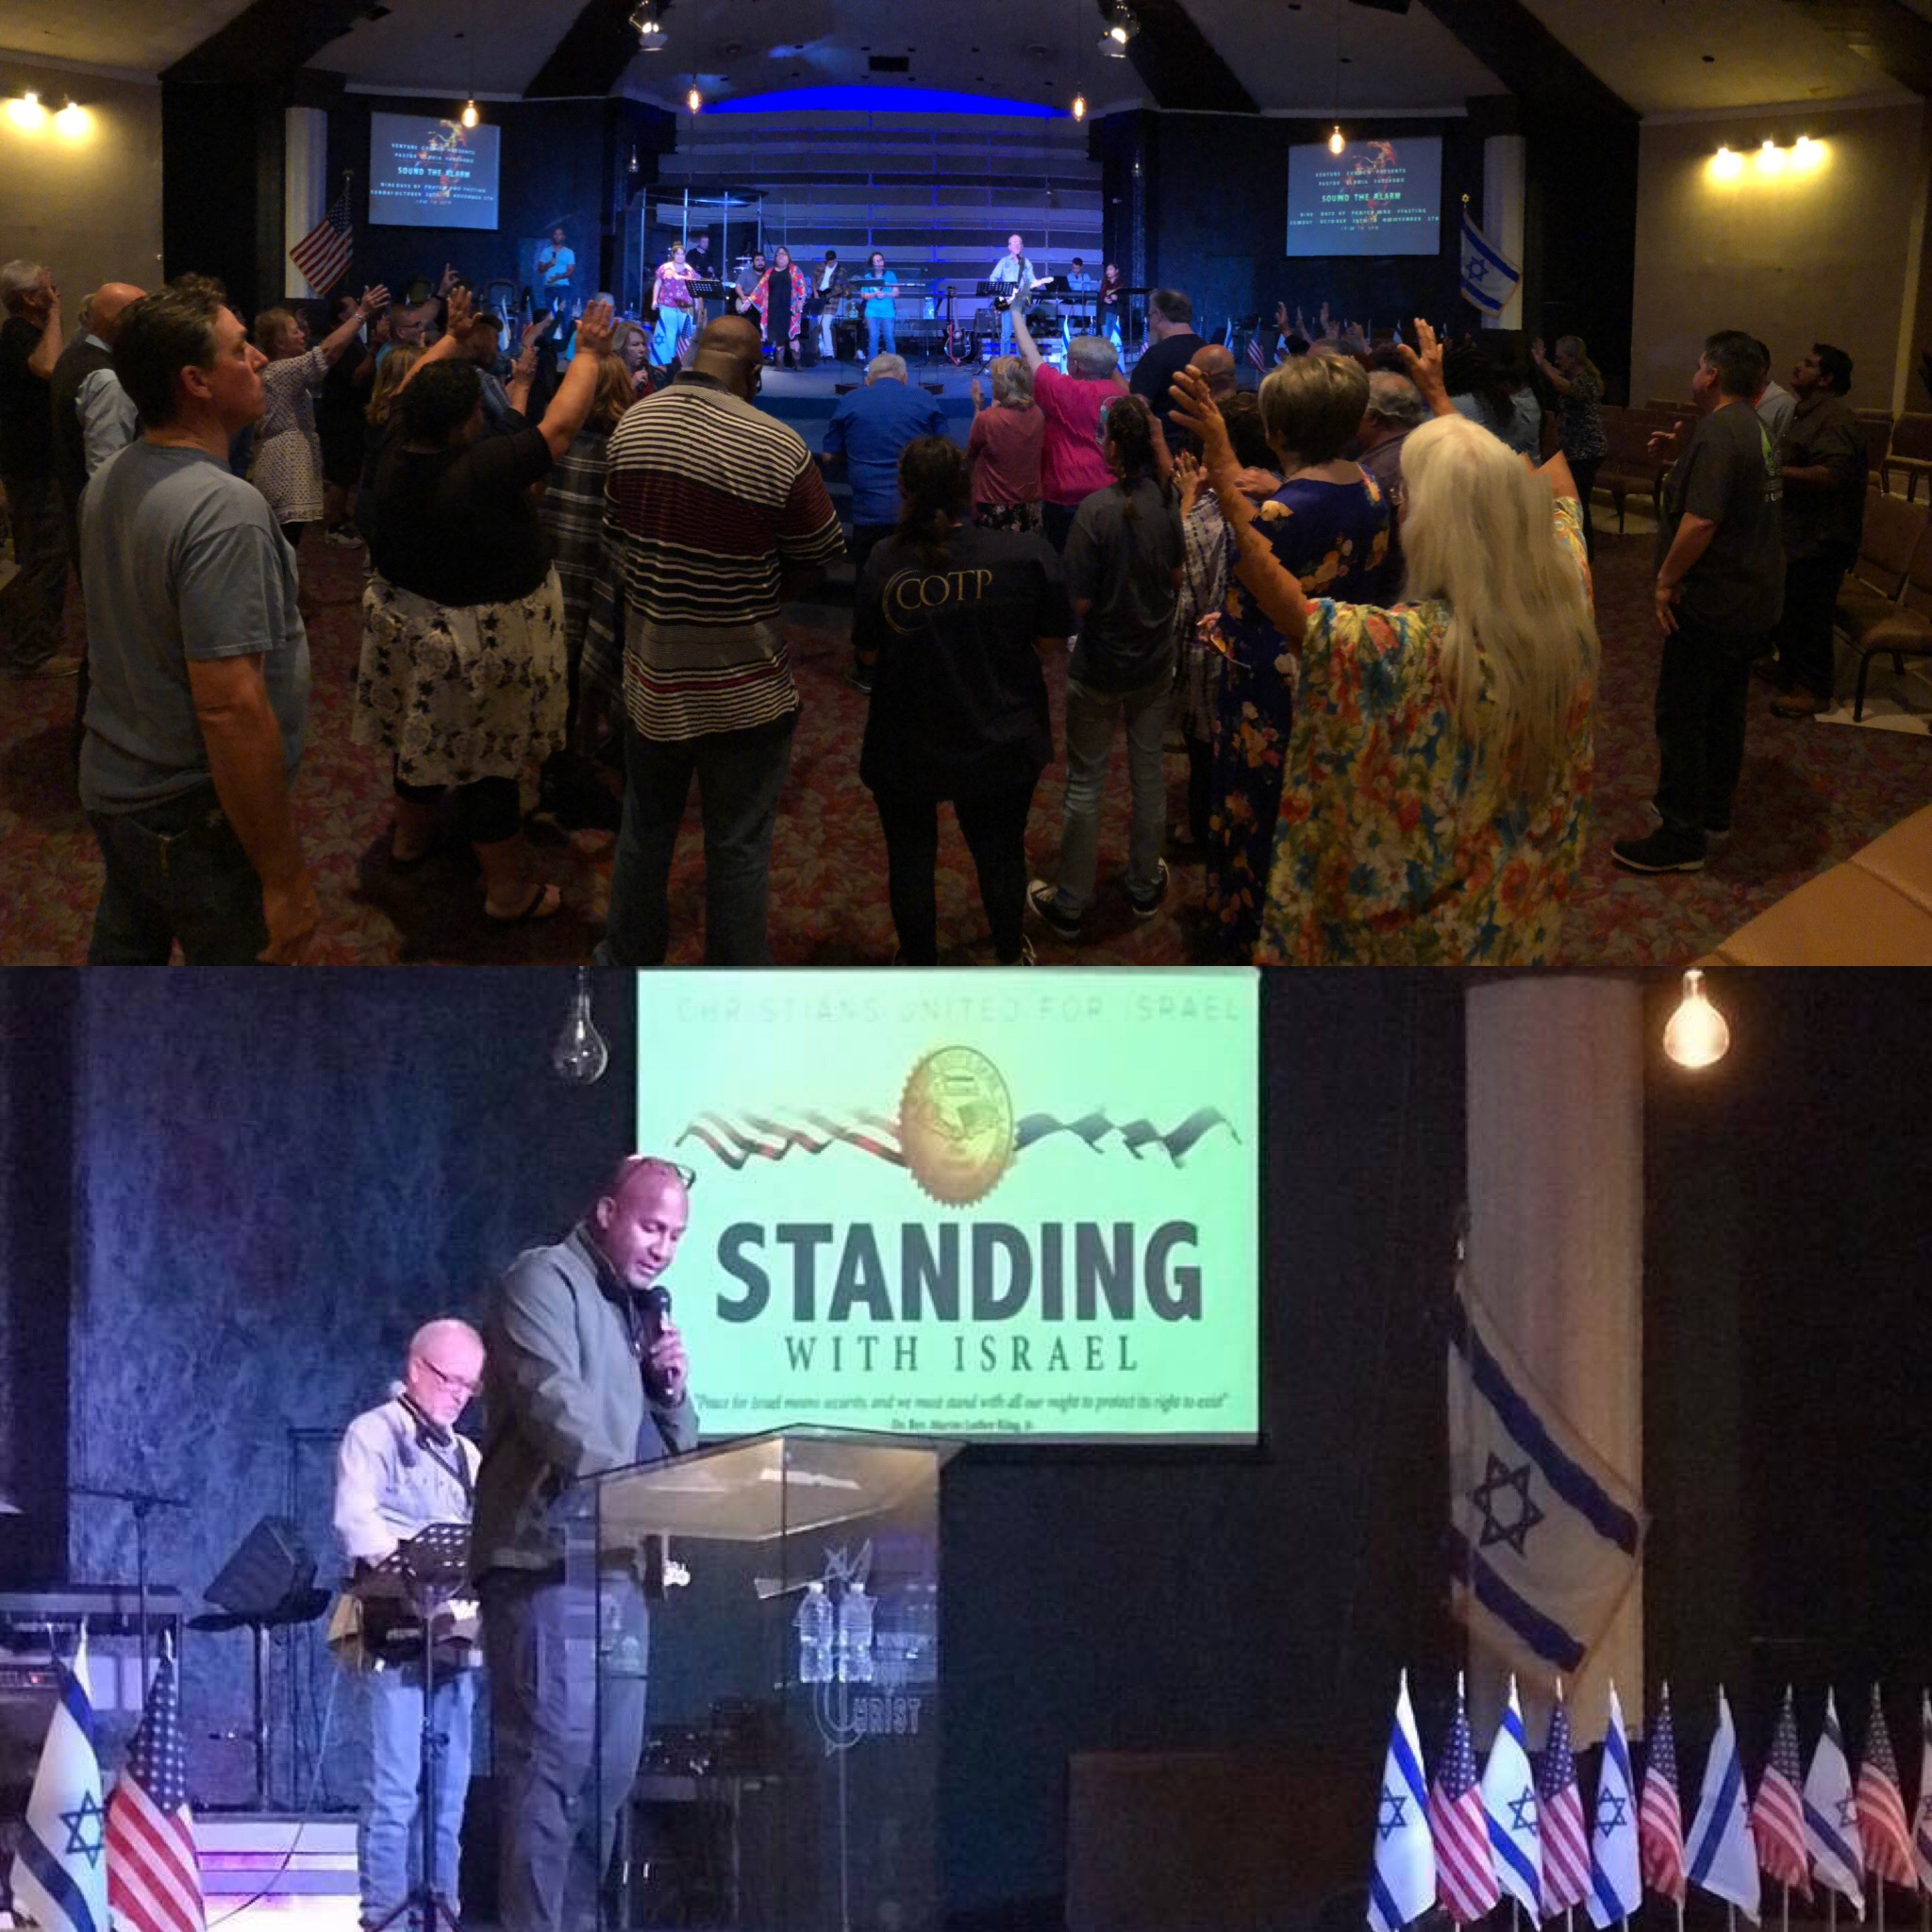 Nov 4 Corpus Christi, TX Stand With Israel